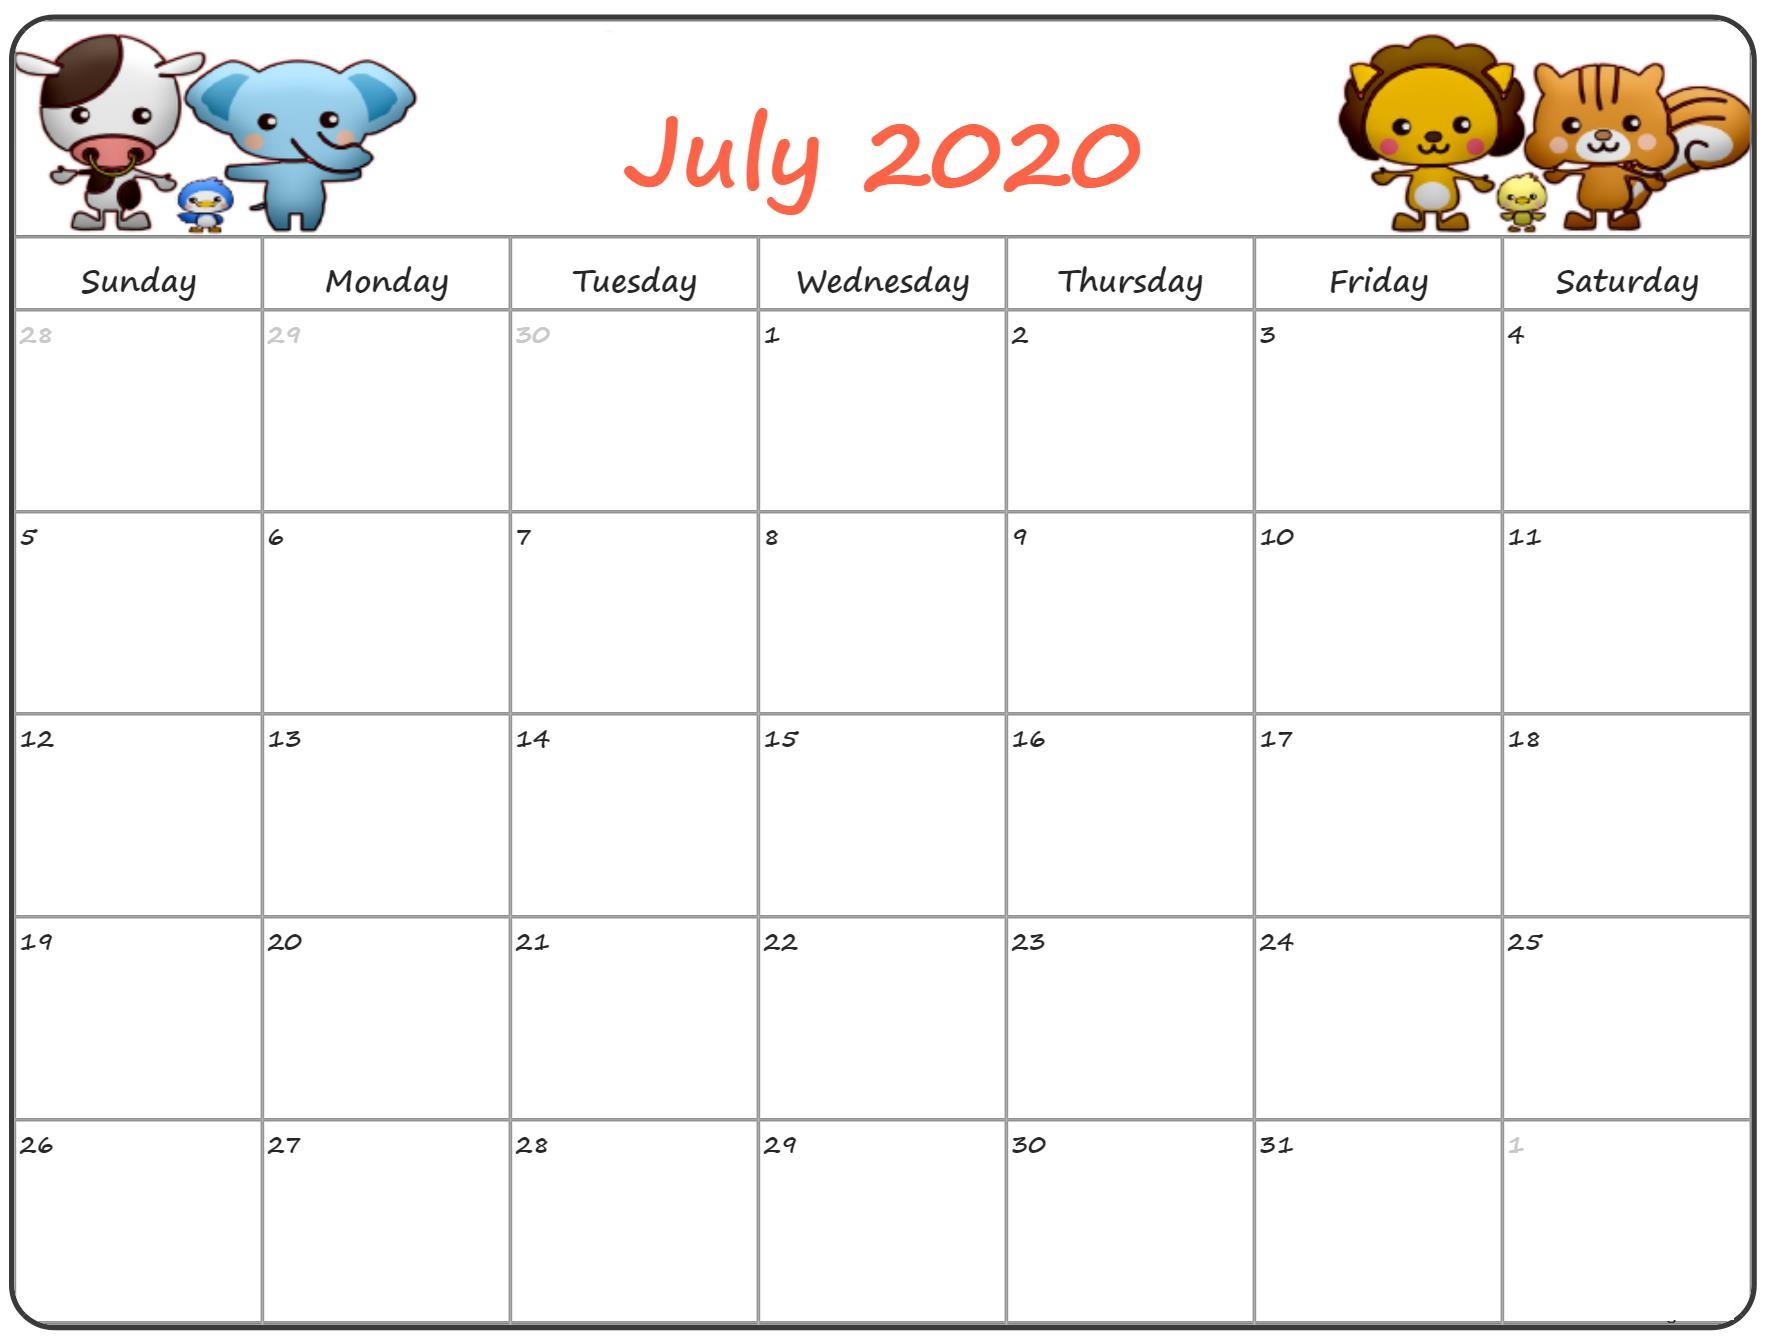 Cute July 2020 Calendar For Kids